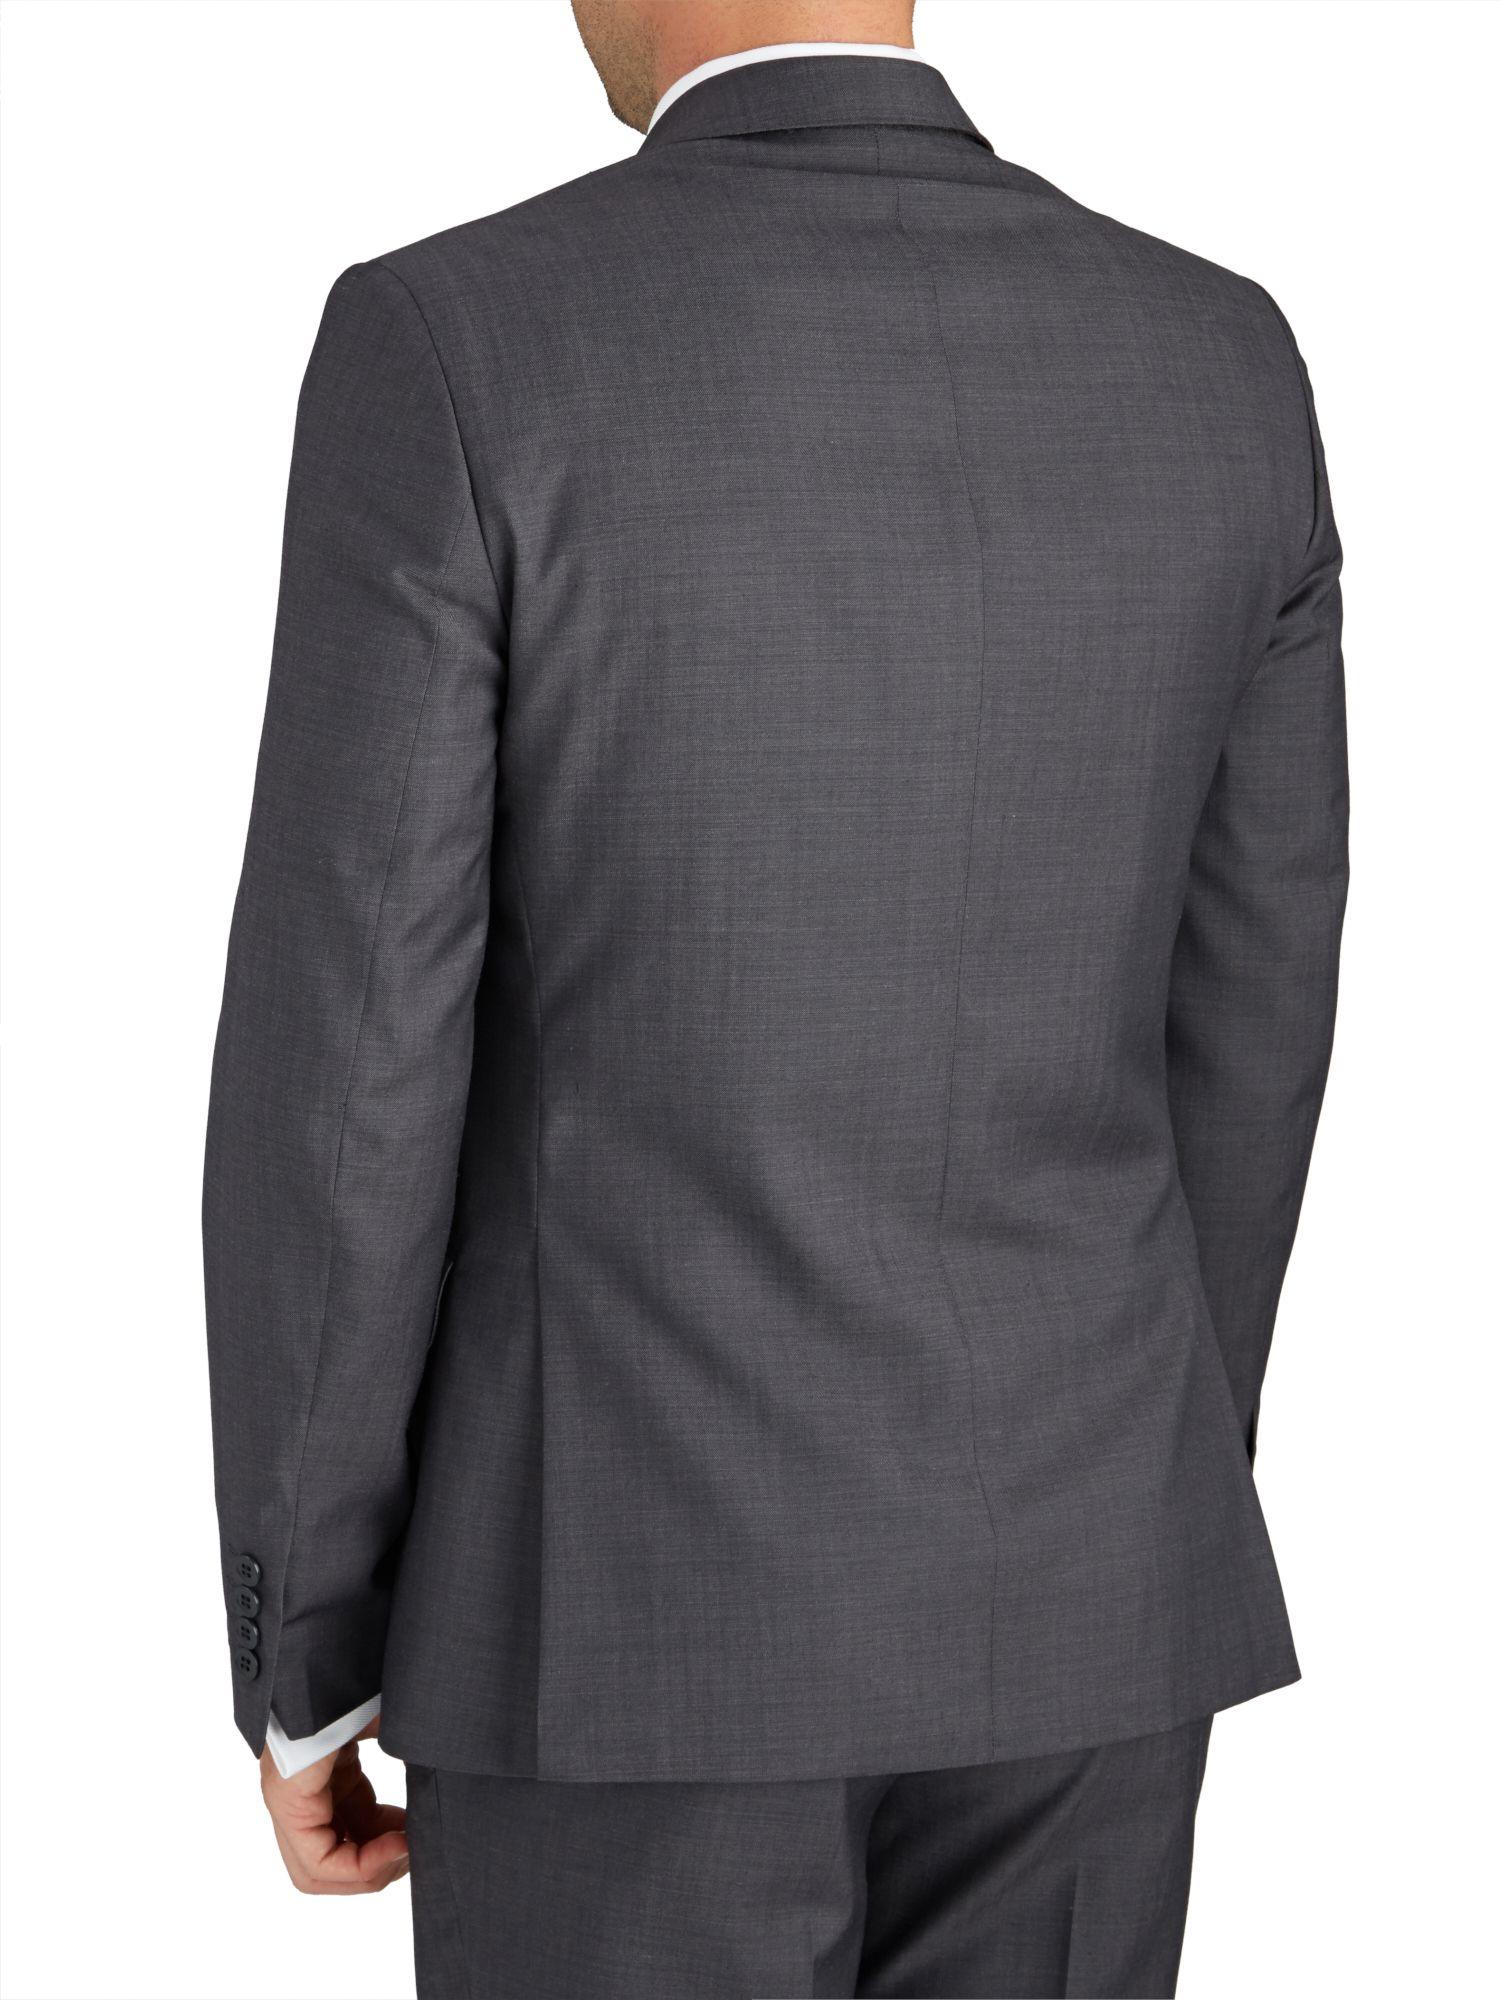 Paul Costelloe Wool Slim Fit Grey Tonic Suit Jacket in Grey for Men